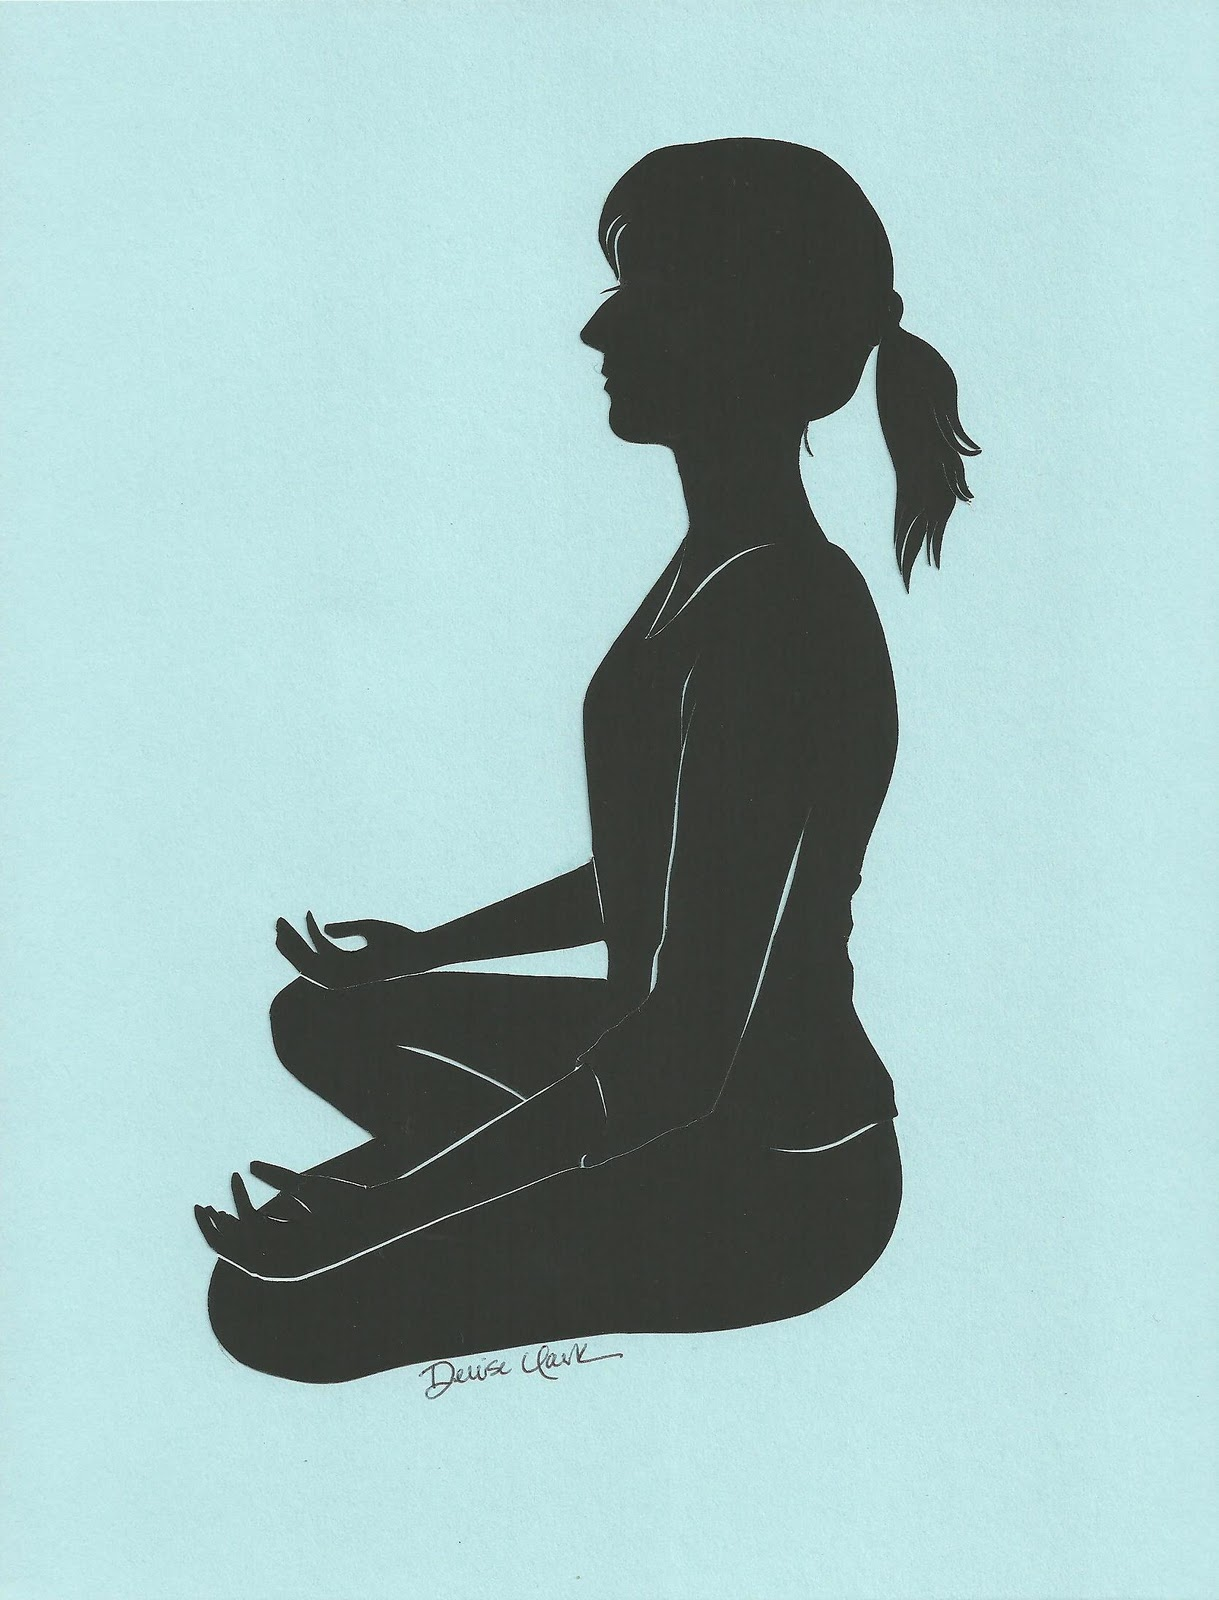 YOGA STONE SILHOUETTES | silhouette-art